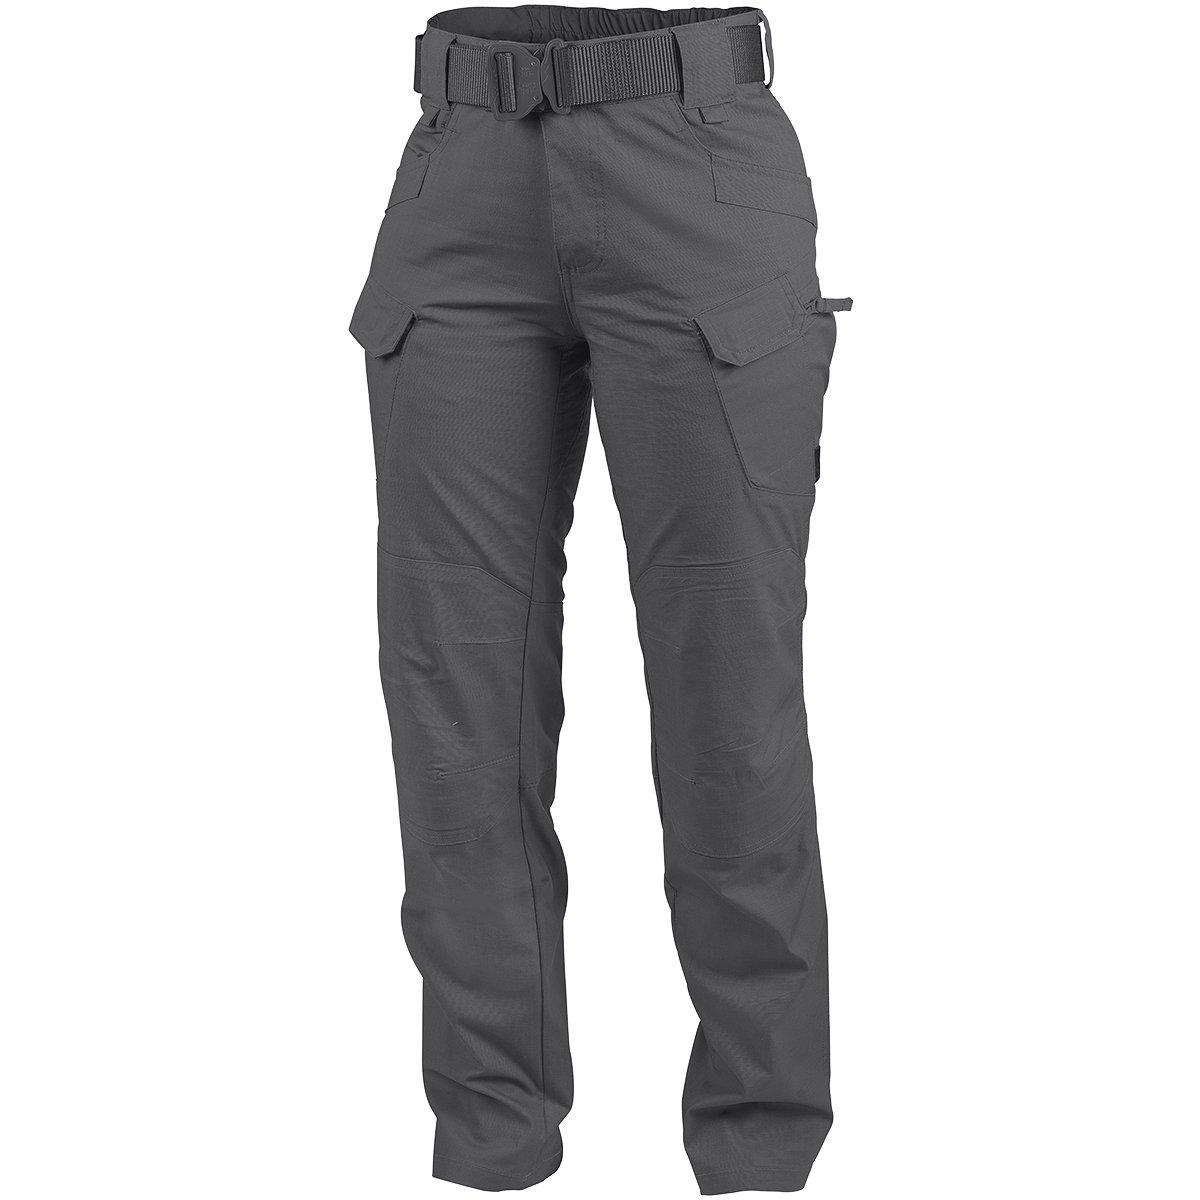 Helikon Women's UTP Trousers Shadow Grey Polycotton Ripstop HELIKON-TEX